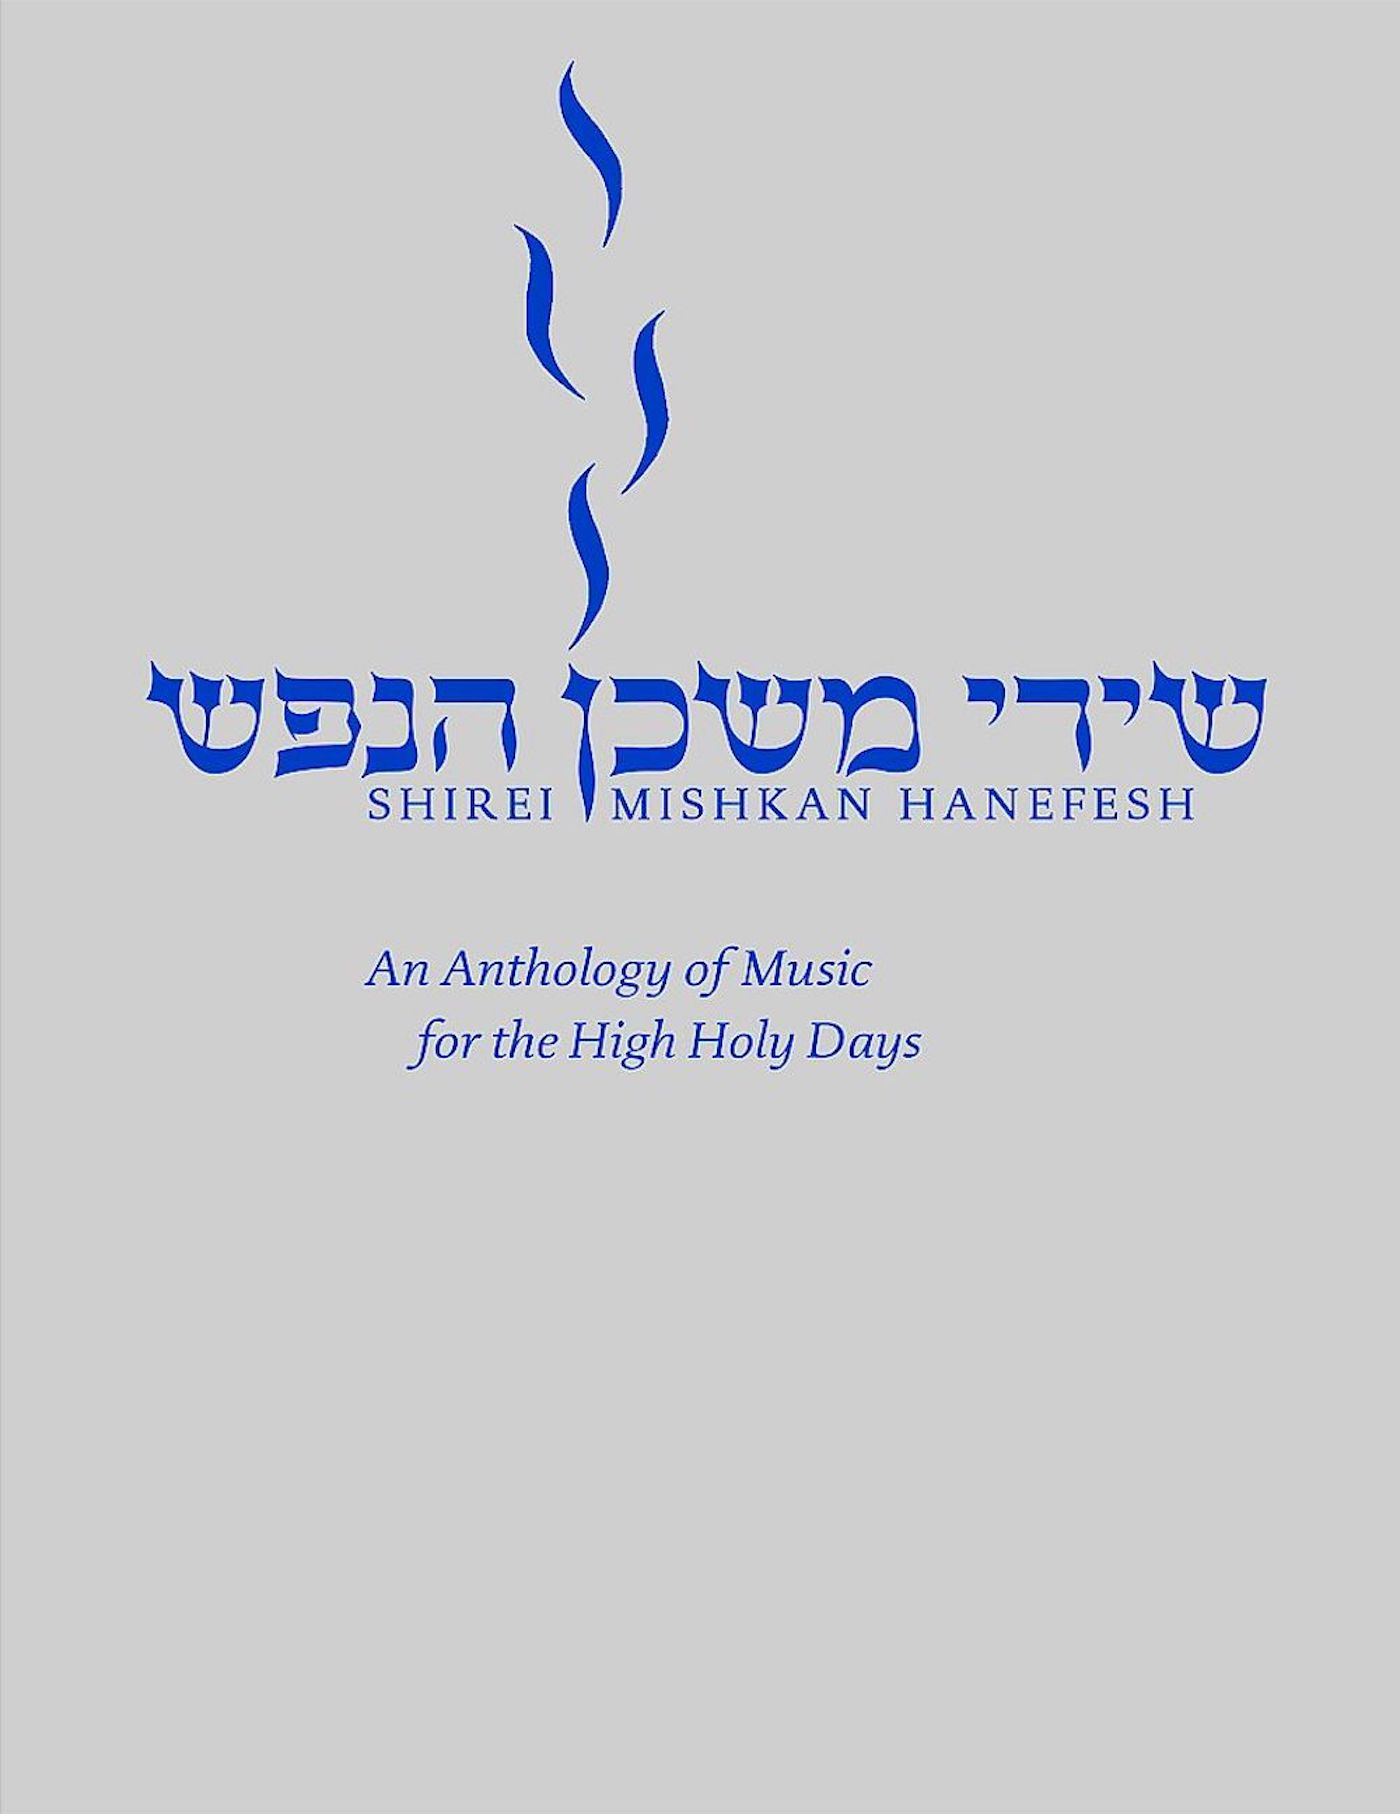 Shirei Mishkan HaNefesh (2 copies as set)